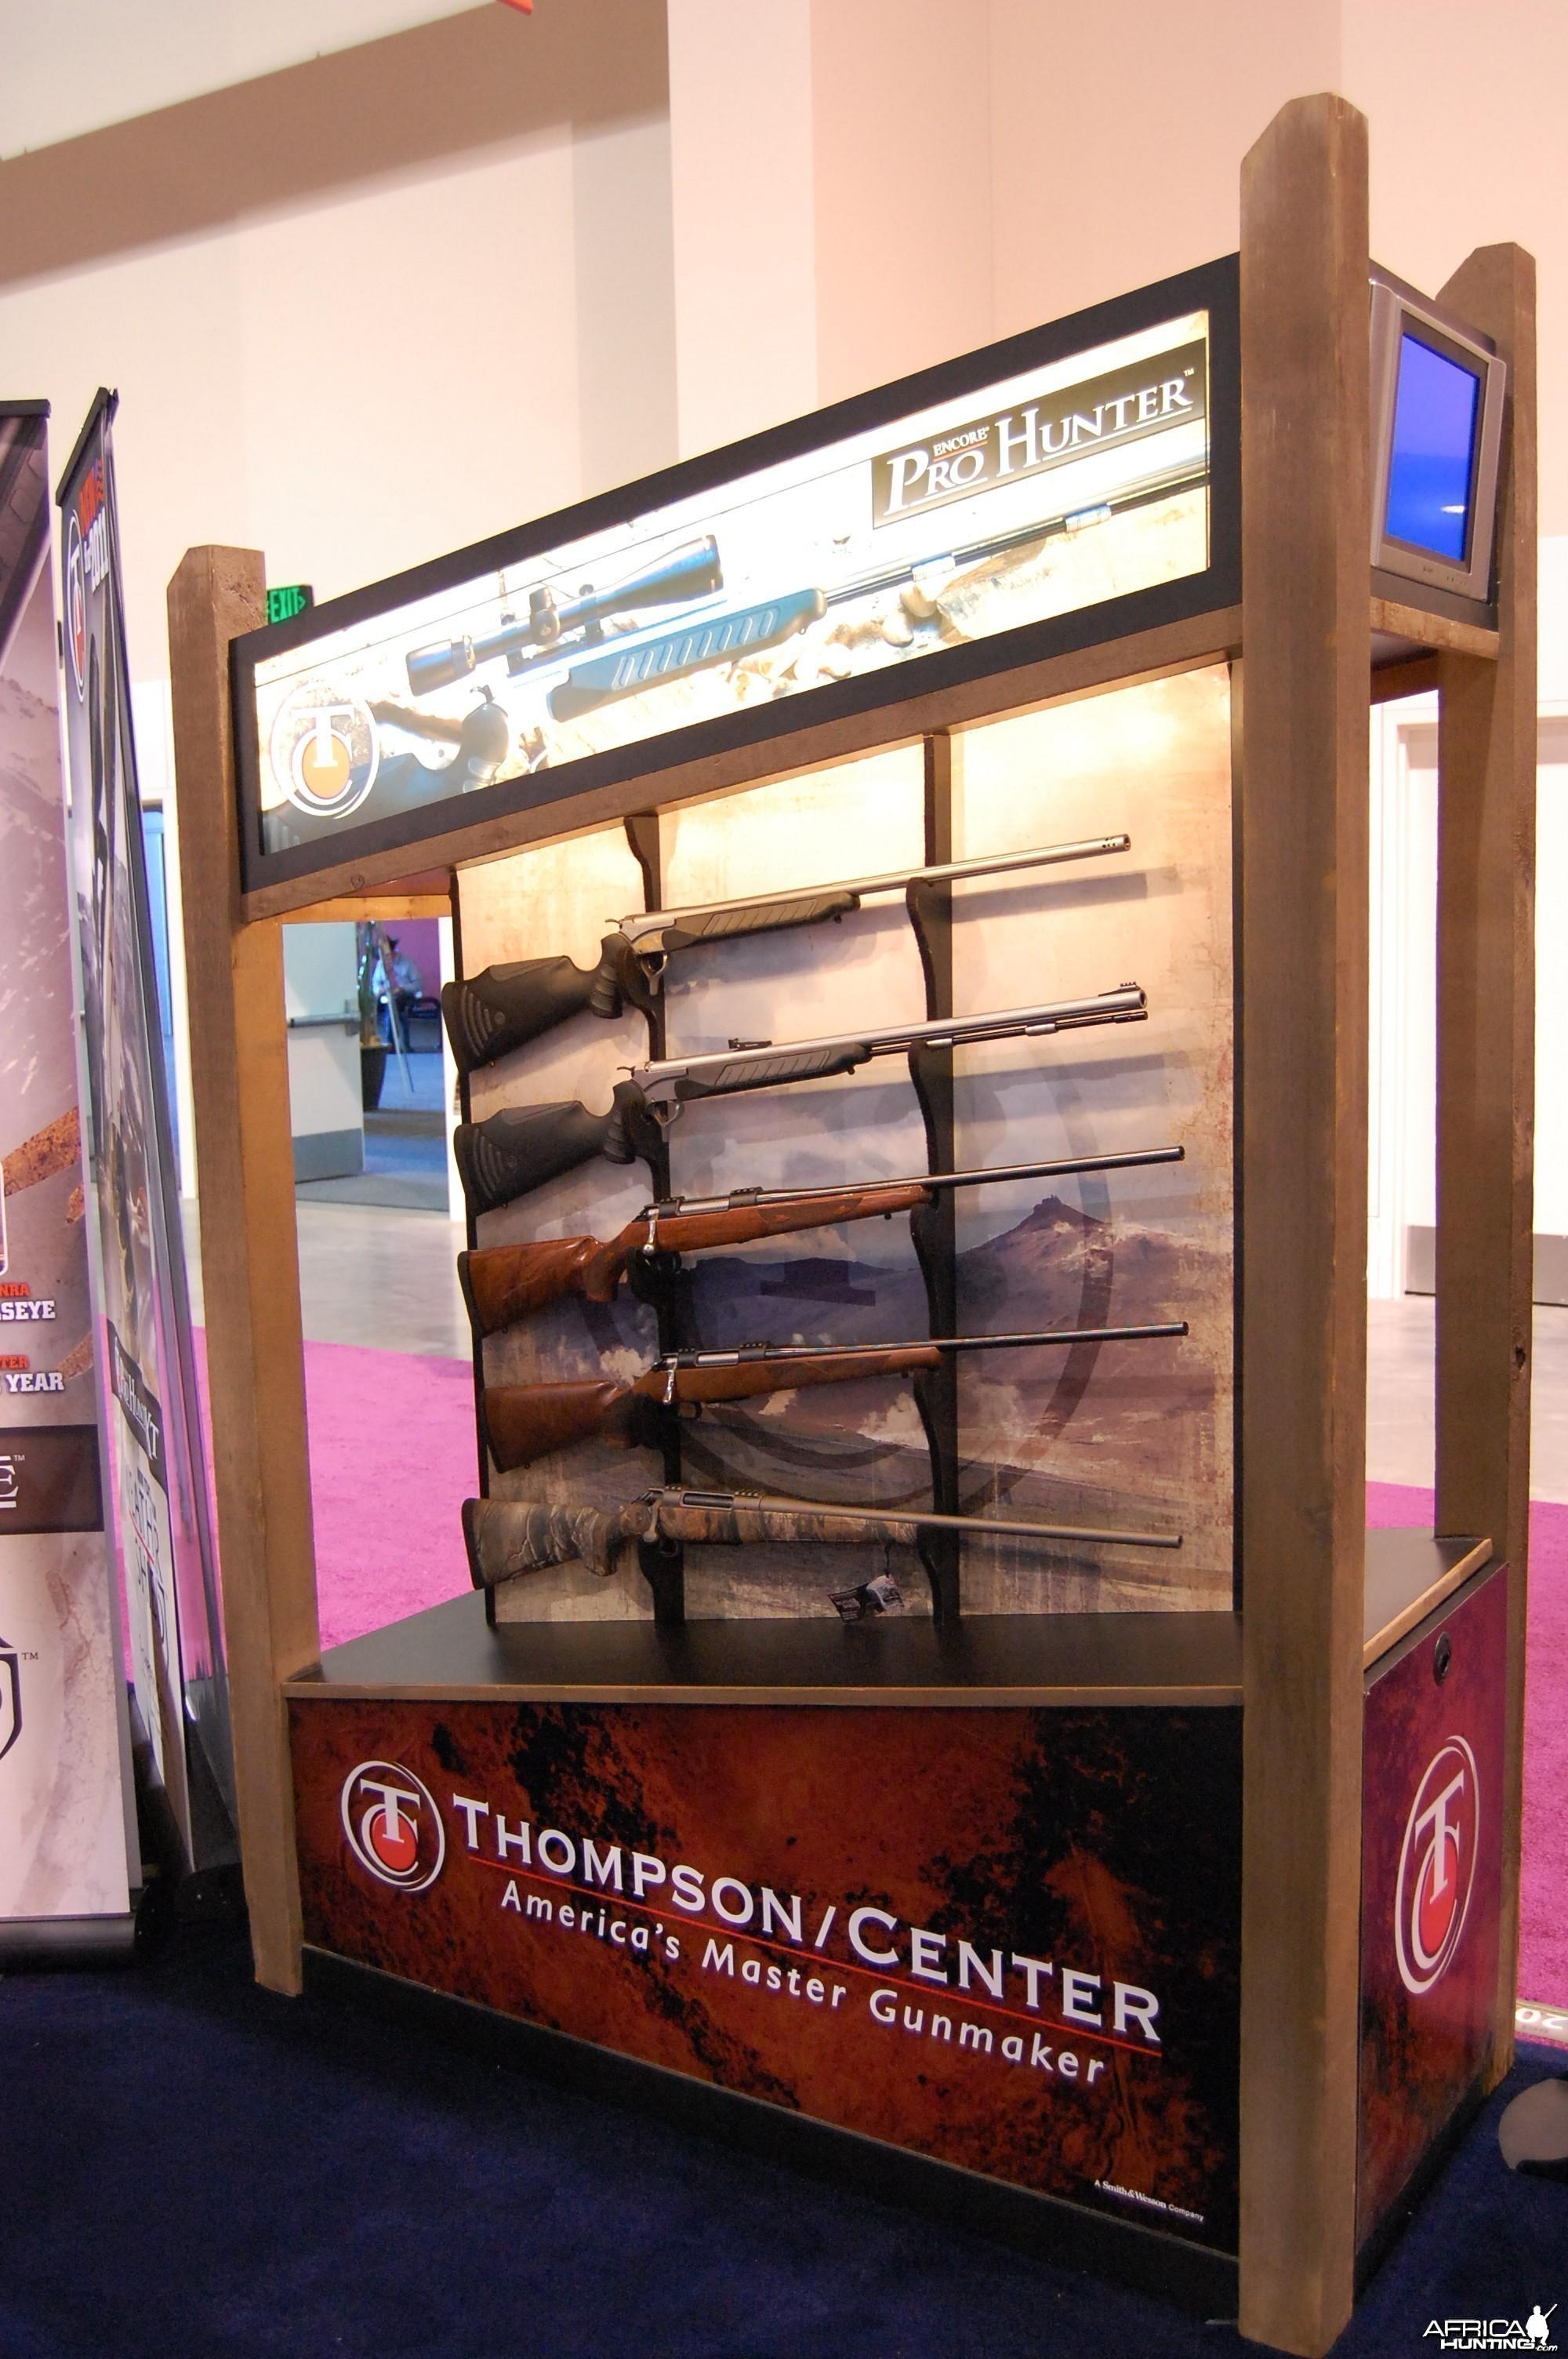 Thomson Center